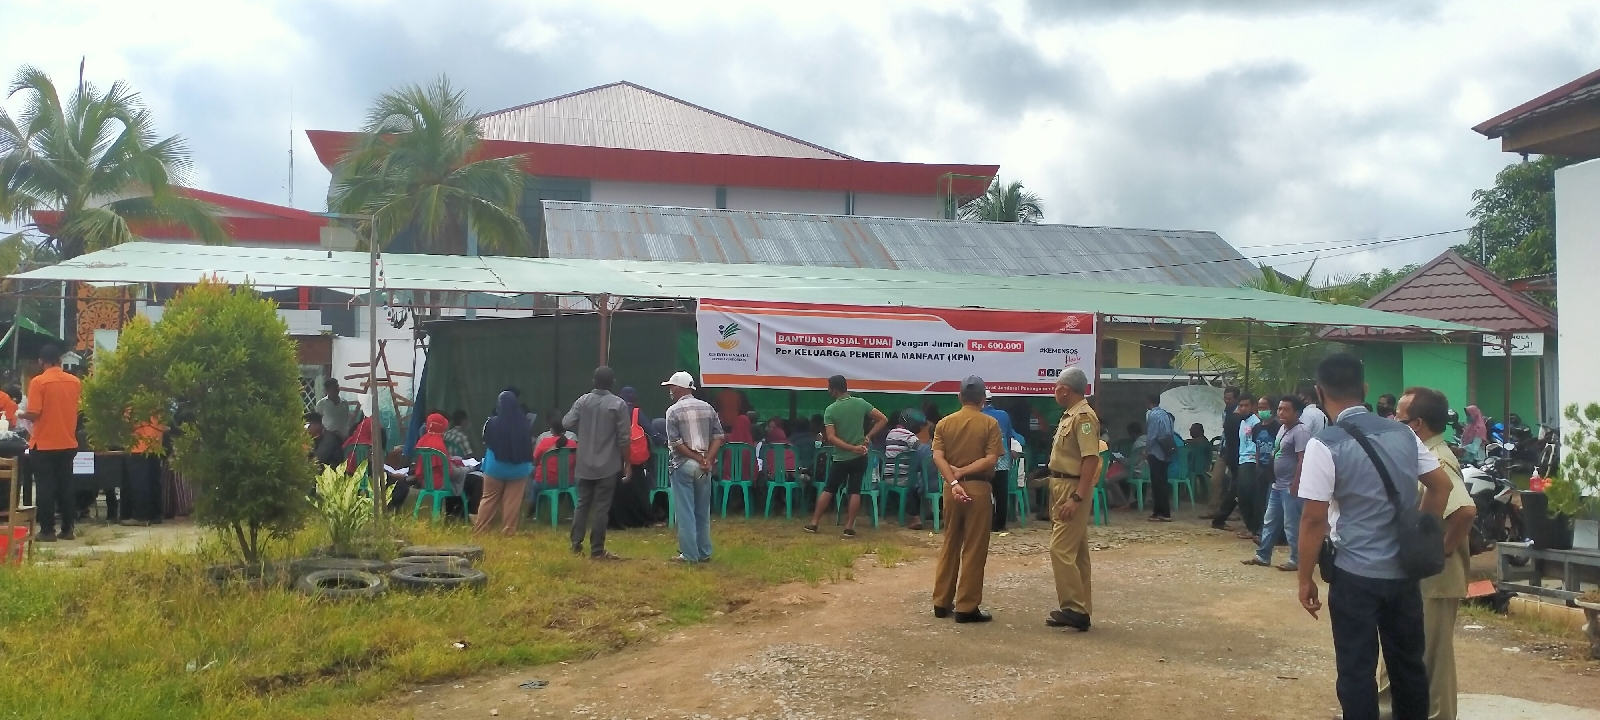 Warga Kecamatan Kapuas Kabupaten Sanggau,Menerima Bantuan Sosial Tunai ditahap Pertama